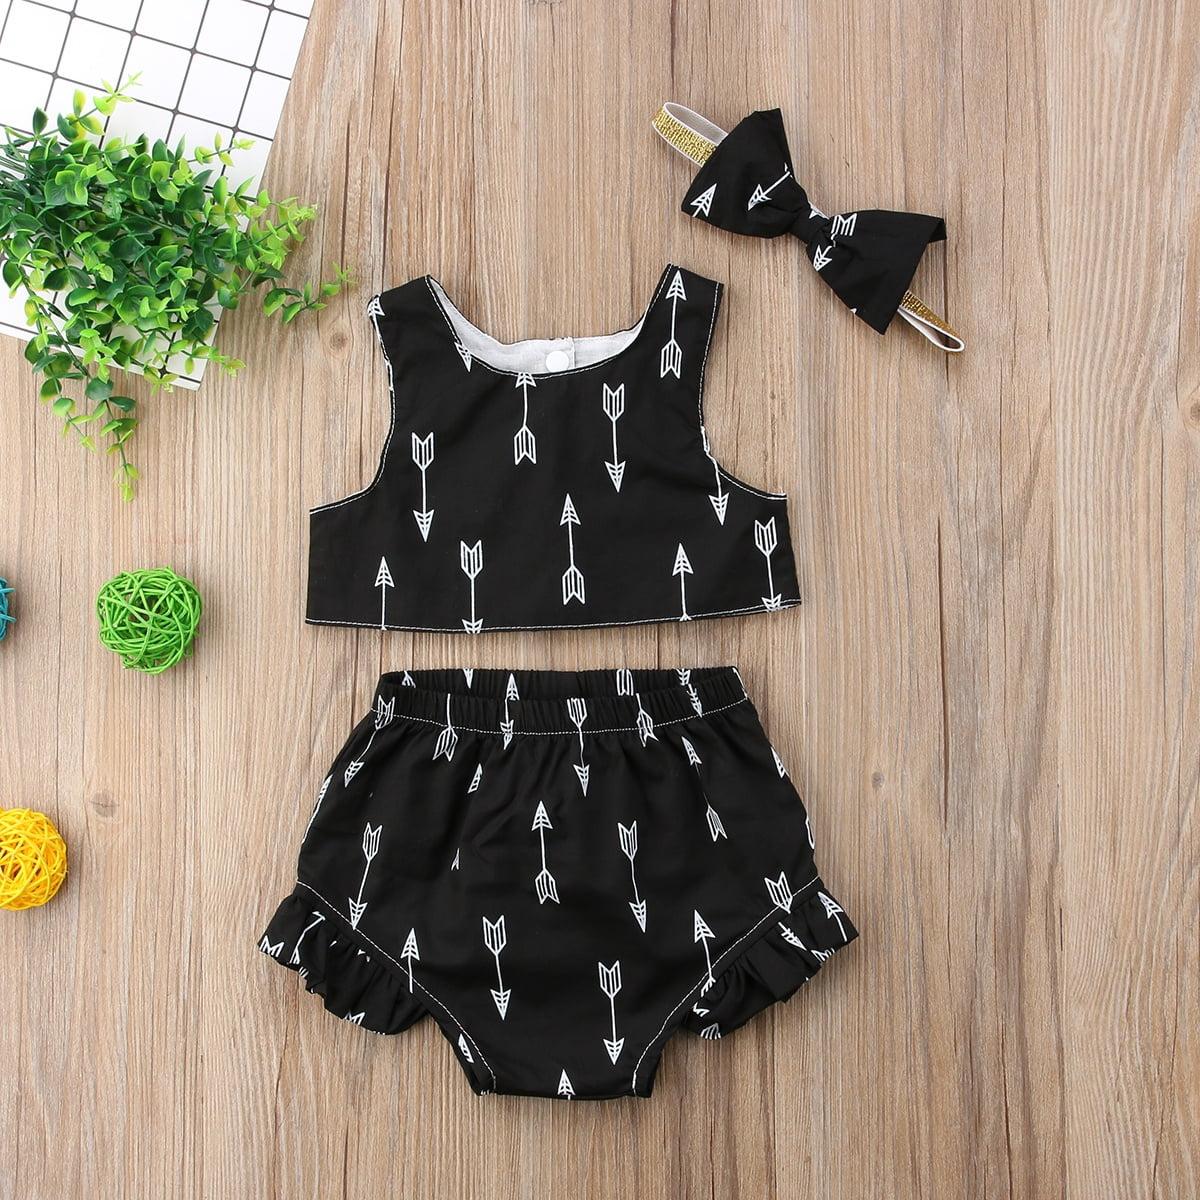 5bd23387ca4 2Pcs Newborn Infant Baby Girls Sleeveless Crop Tops Shorts Outfits Sets  Clothes - Walmart.com